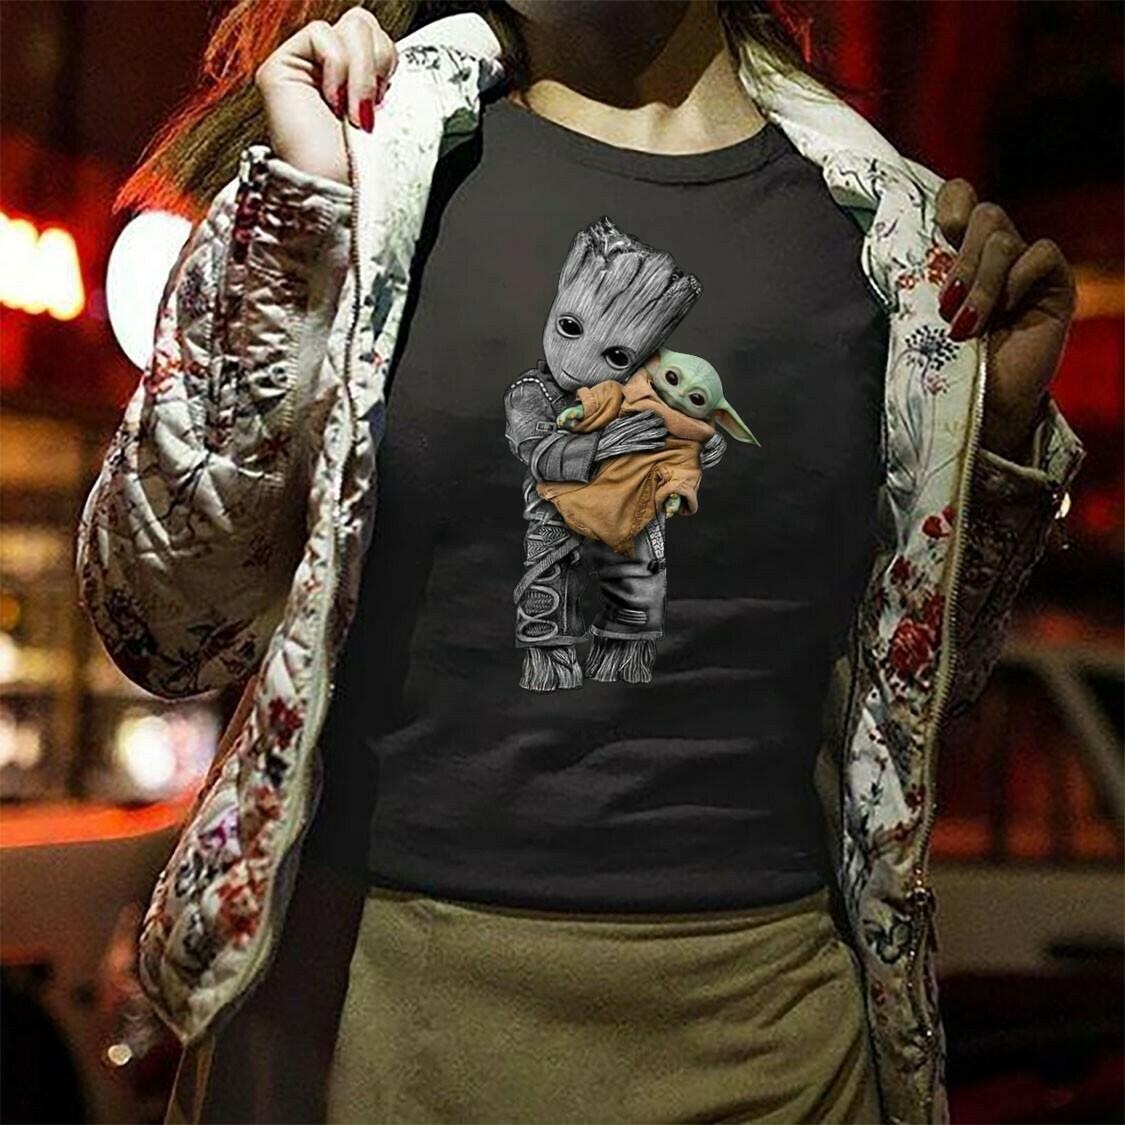 Groot mashup baby yoda shirt,star wars 2019 designs,star wars gifts,Funny Star Wars The Mandalorian The Child First Memories Floating Pod Long Sleeve Sweatshirt Hoodie Jolly Family Gifts